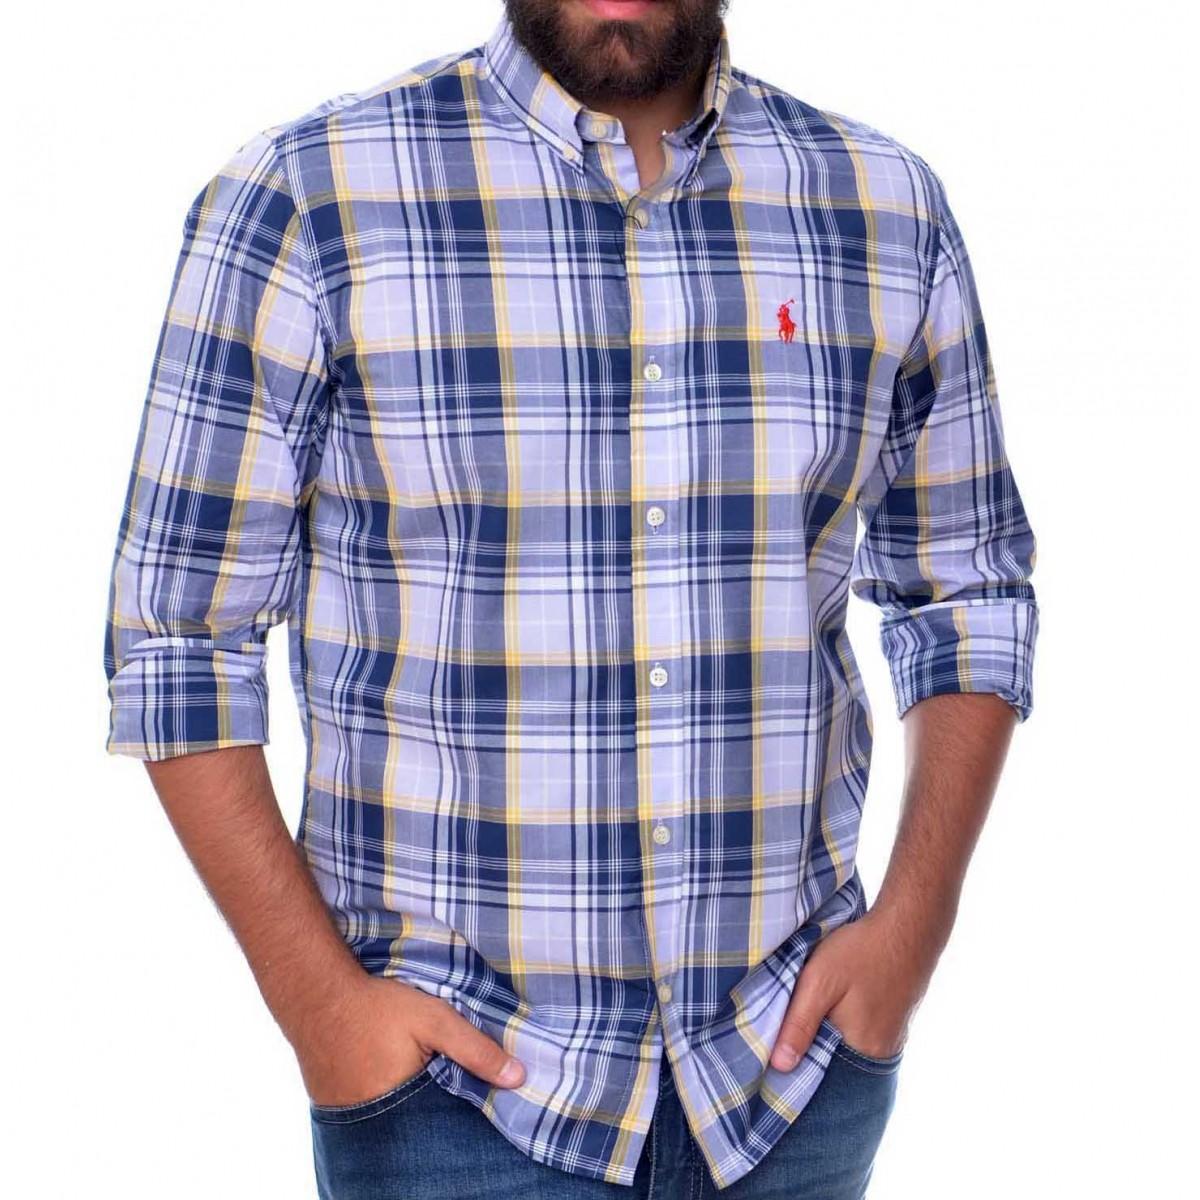 Camisa Social RL Xadrez AZ - Regular Fit